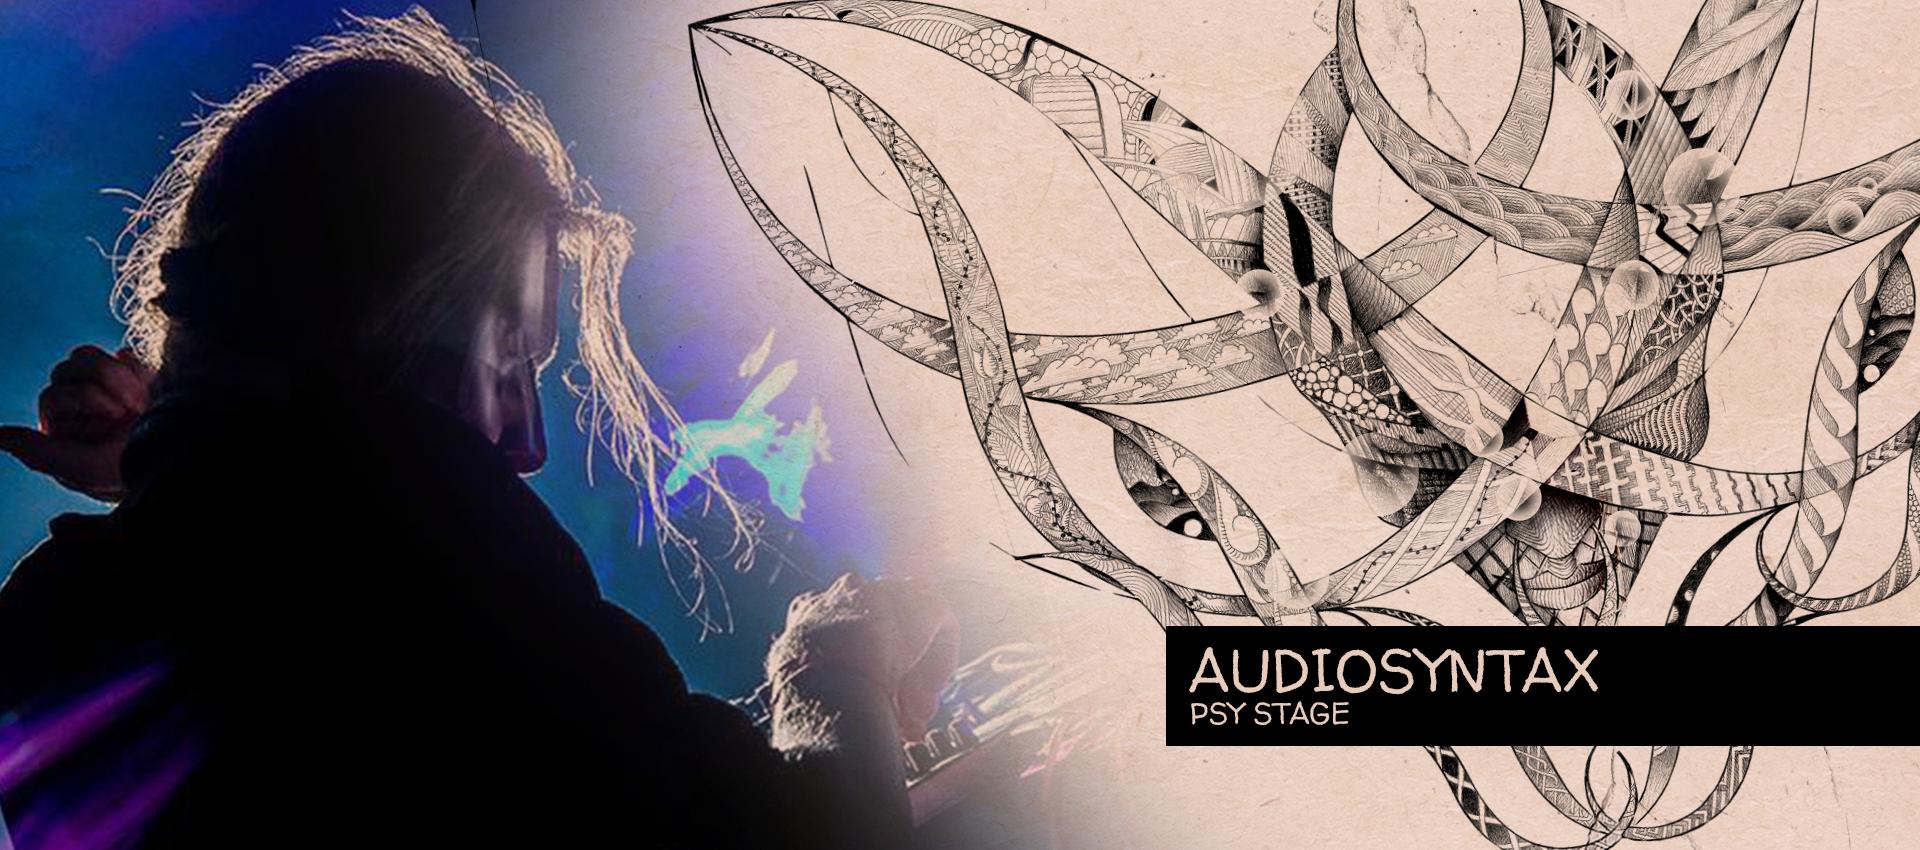 Audiosyntax